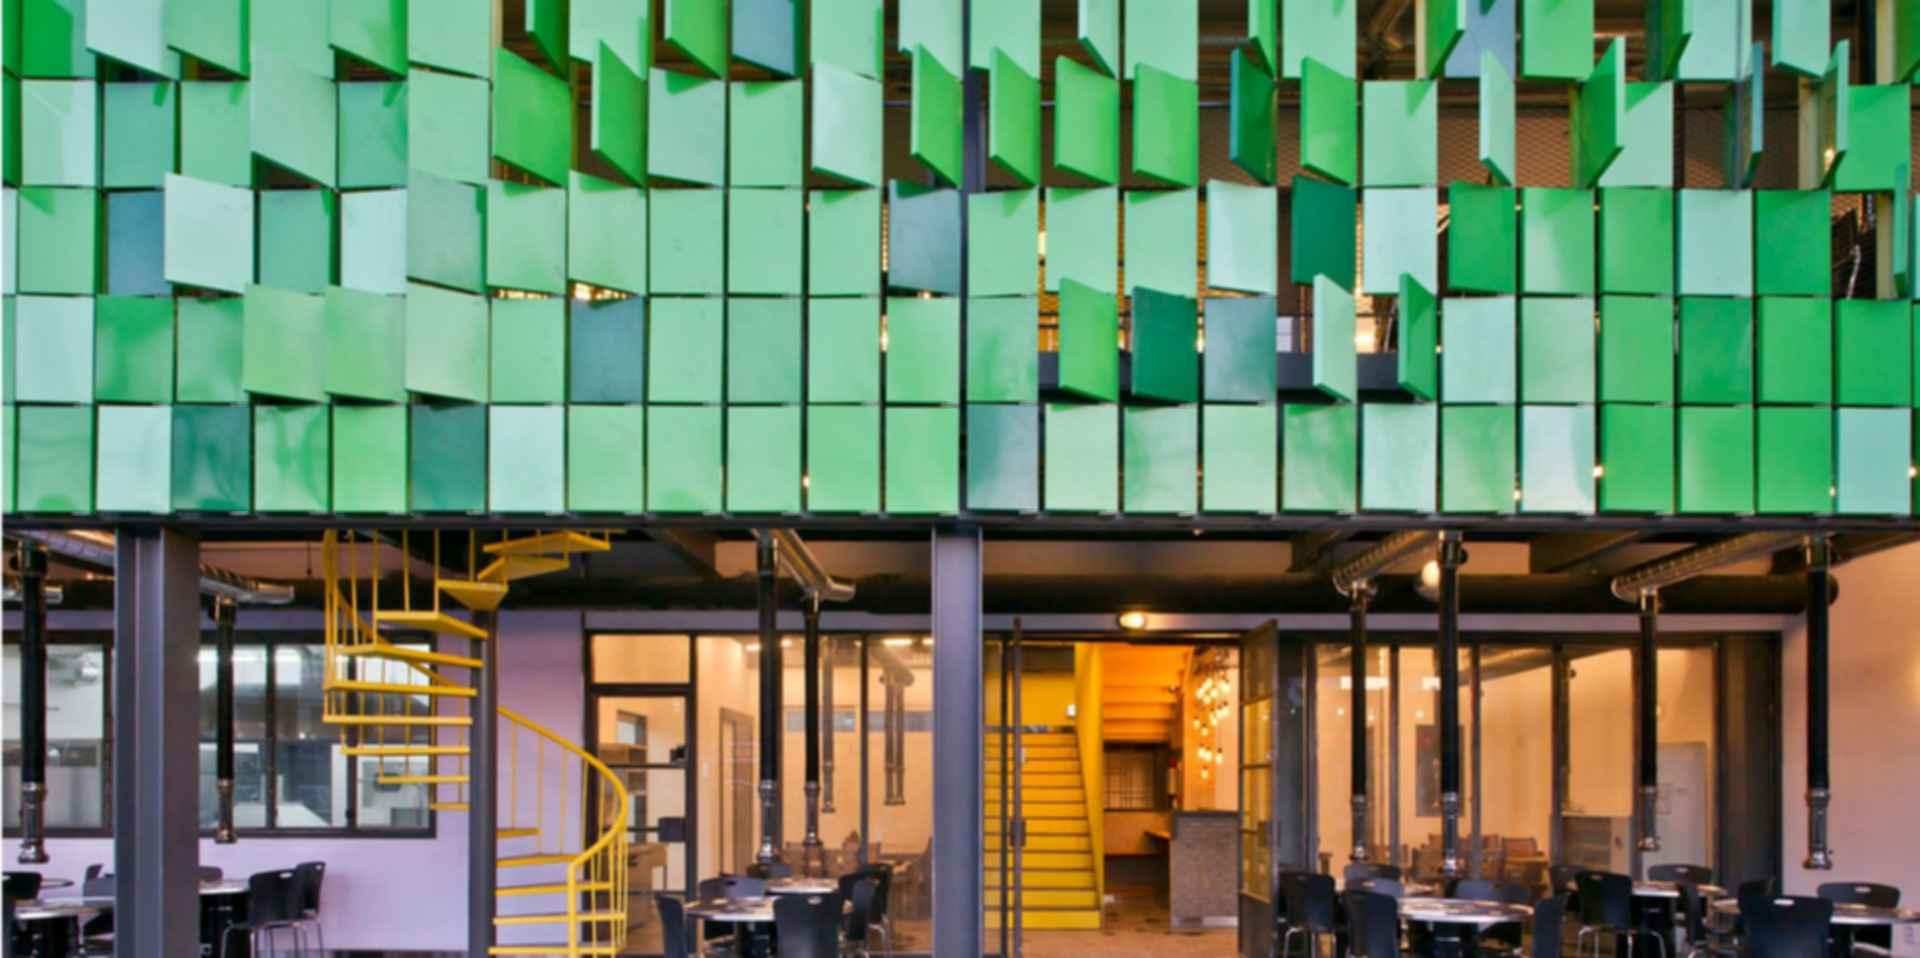 The Forest House - Exterior/Facade